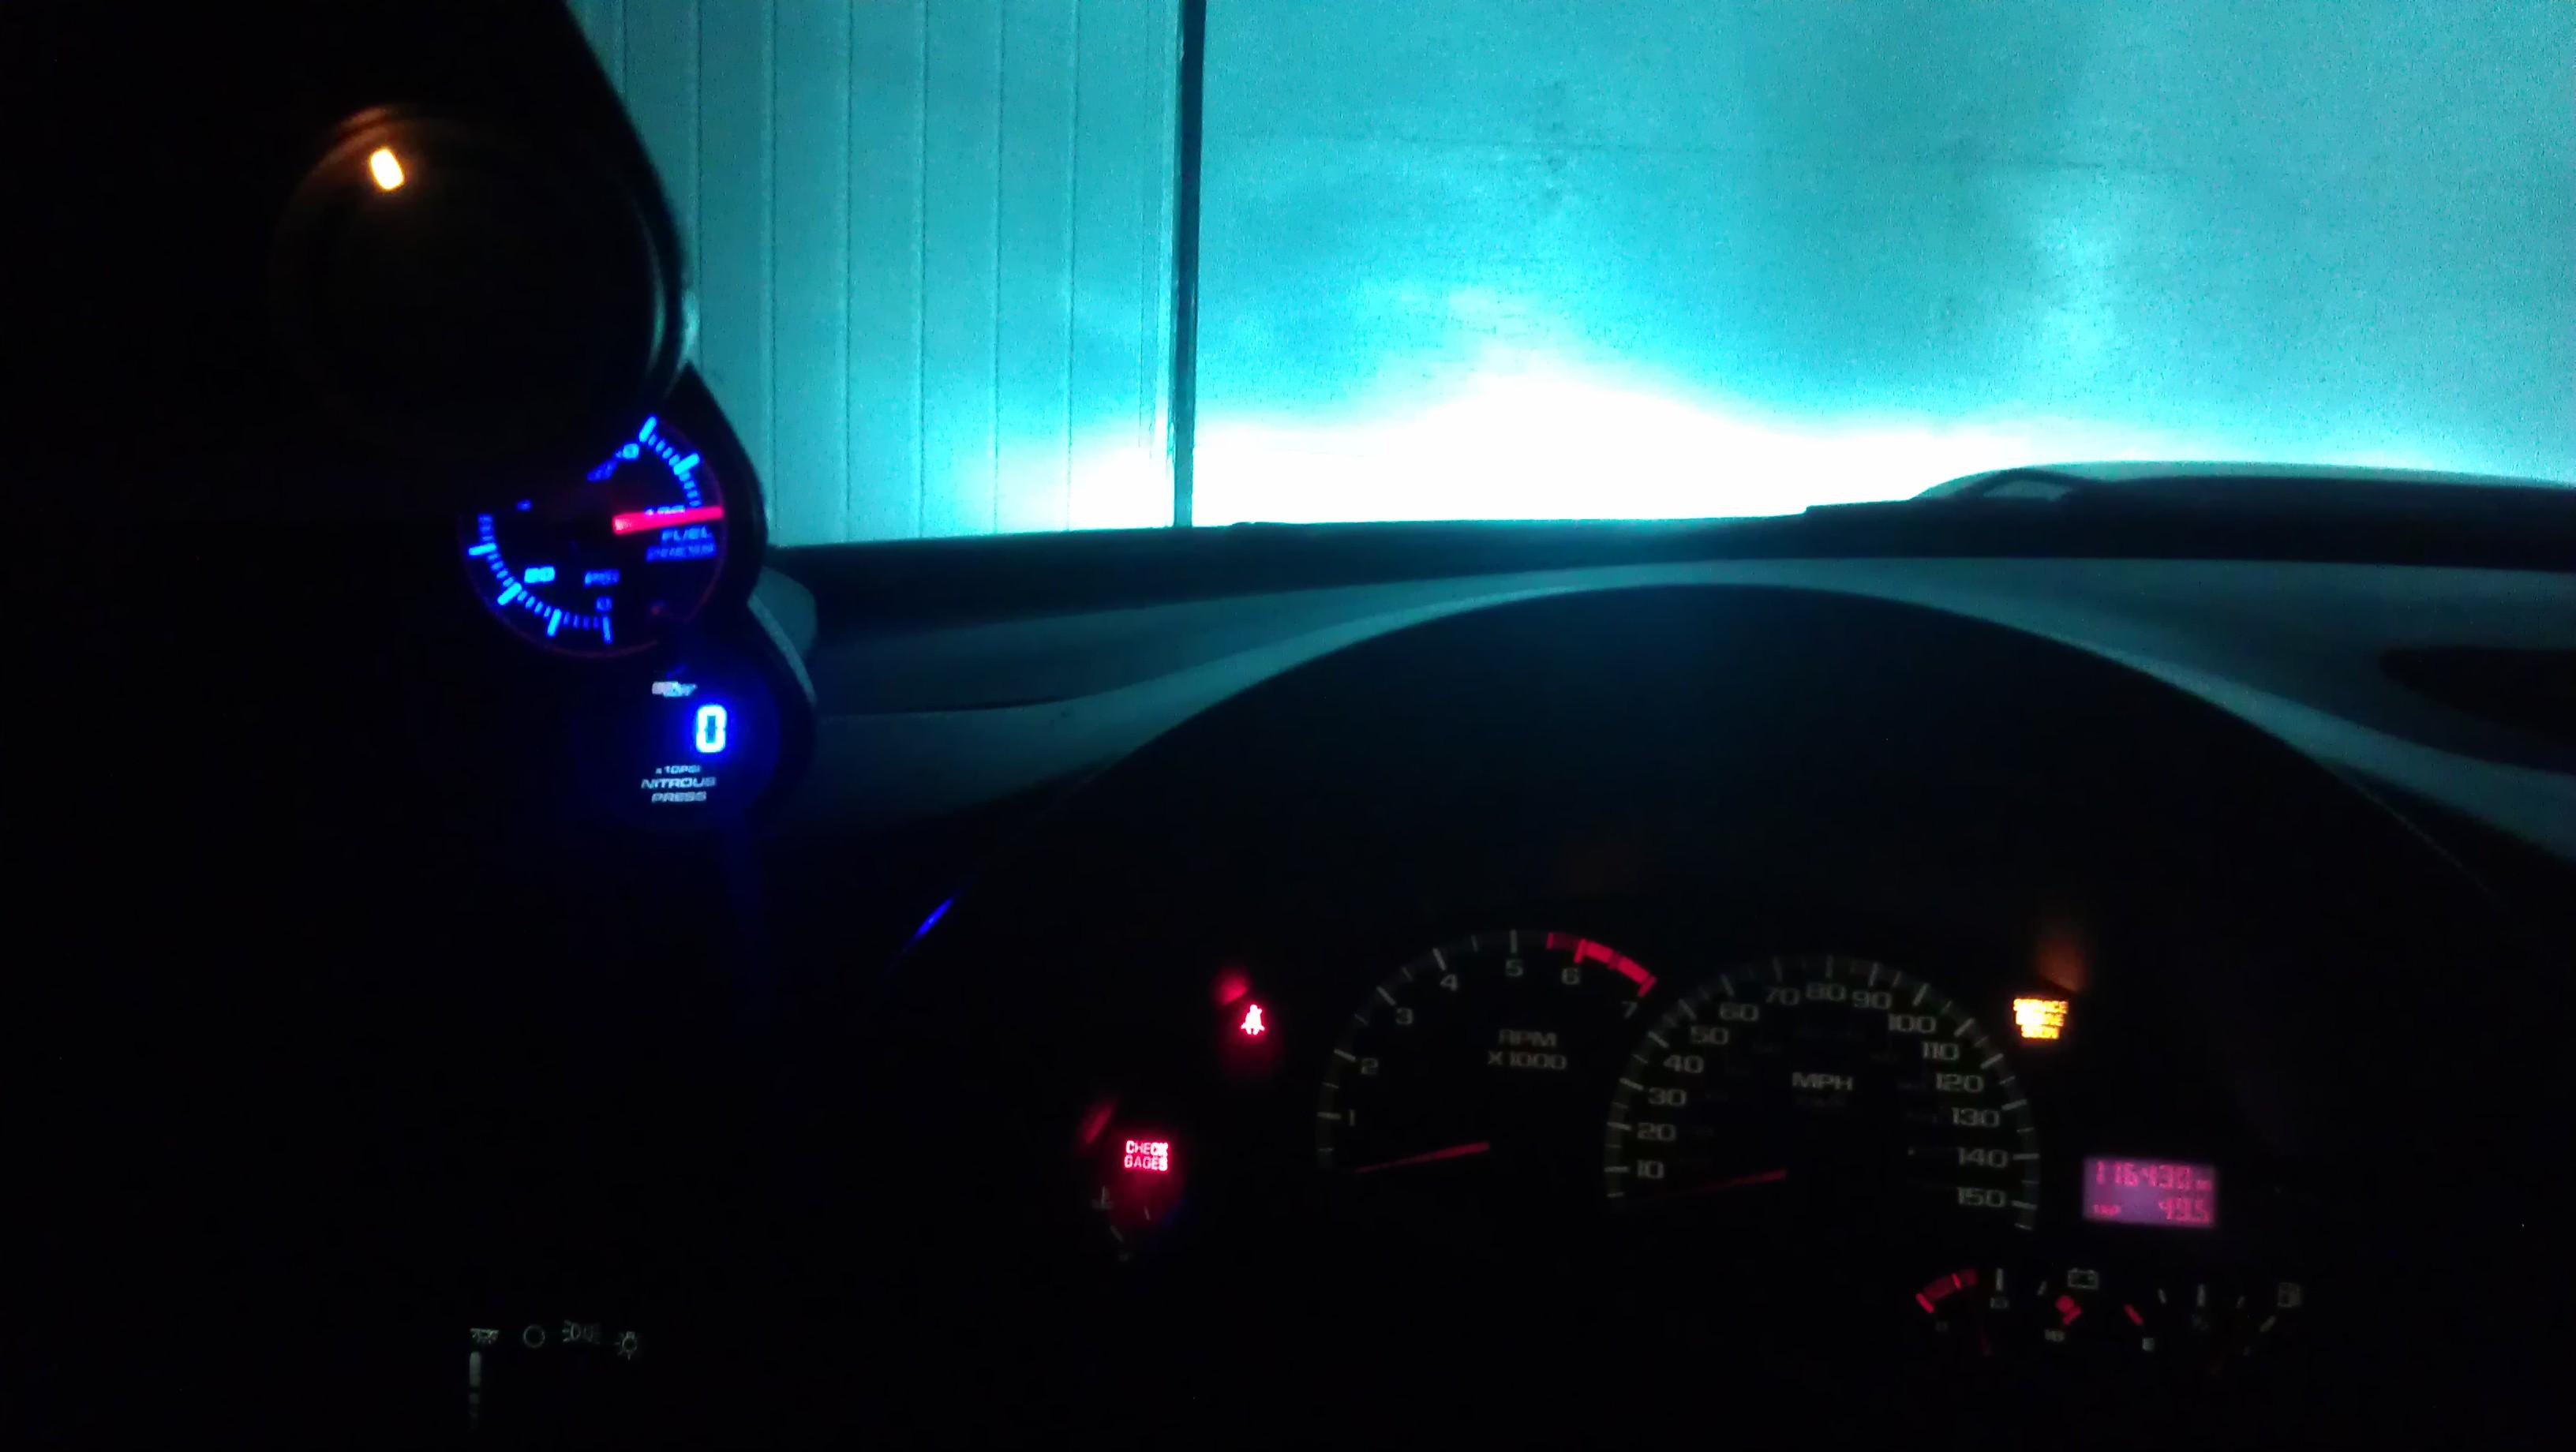 nitrous water temp gauge wiring diagram ford jubilee glowshift fuel and pressure i like it